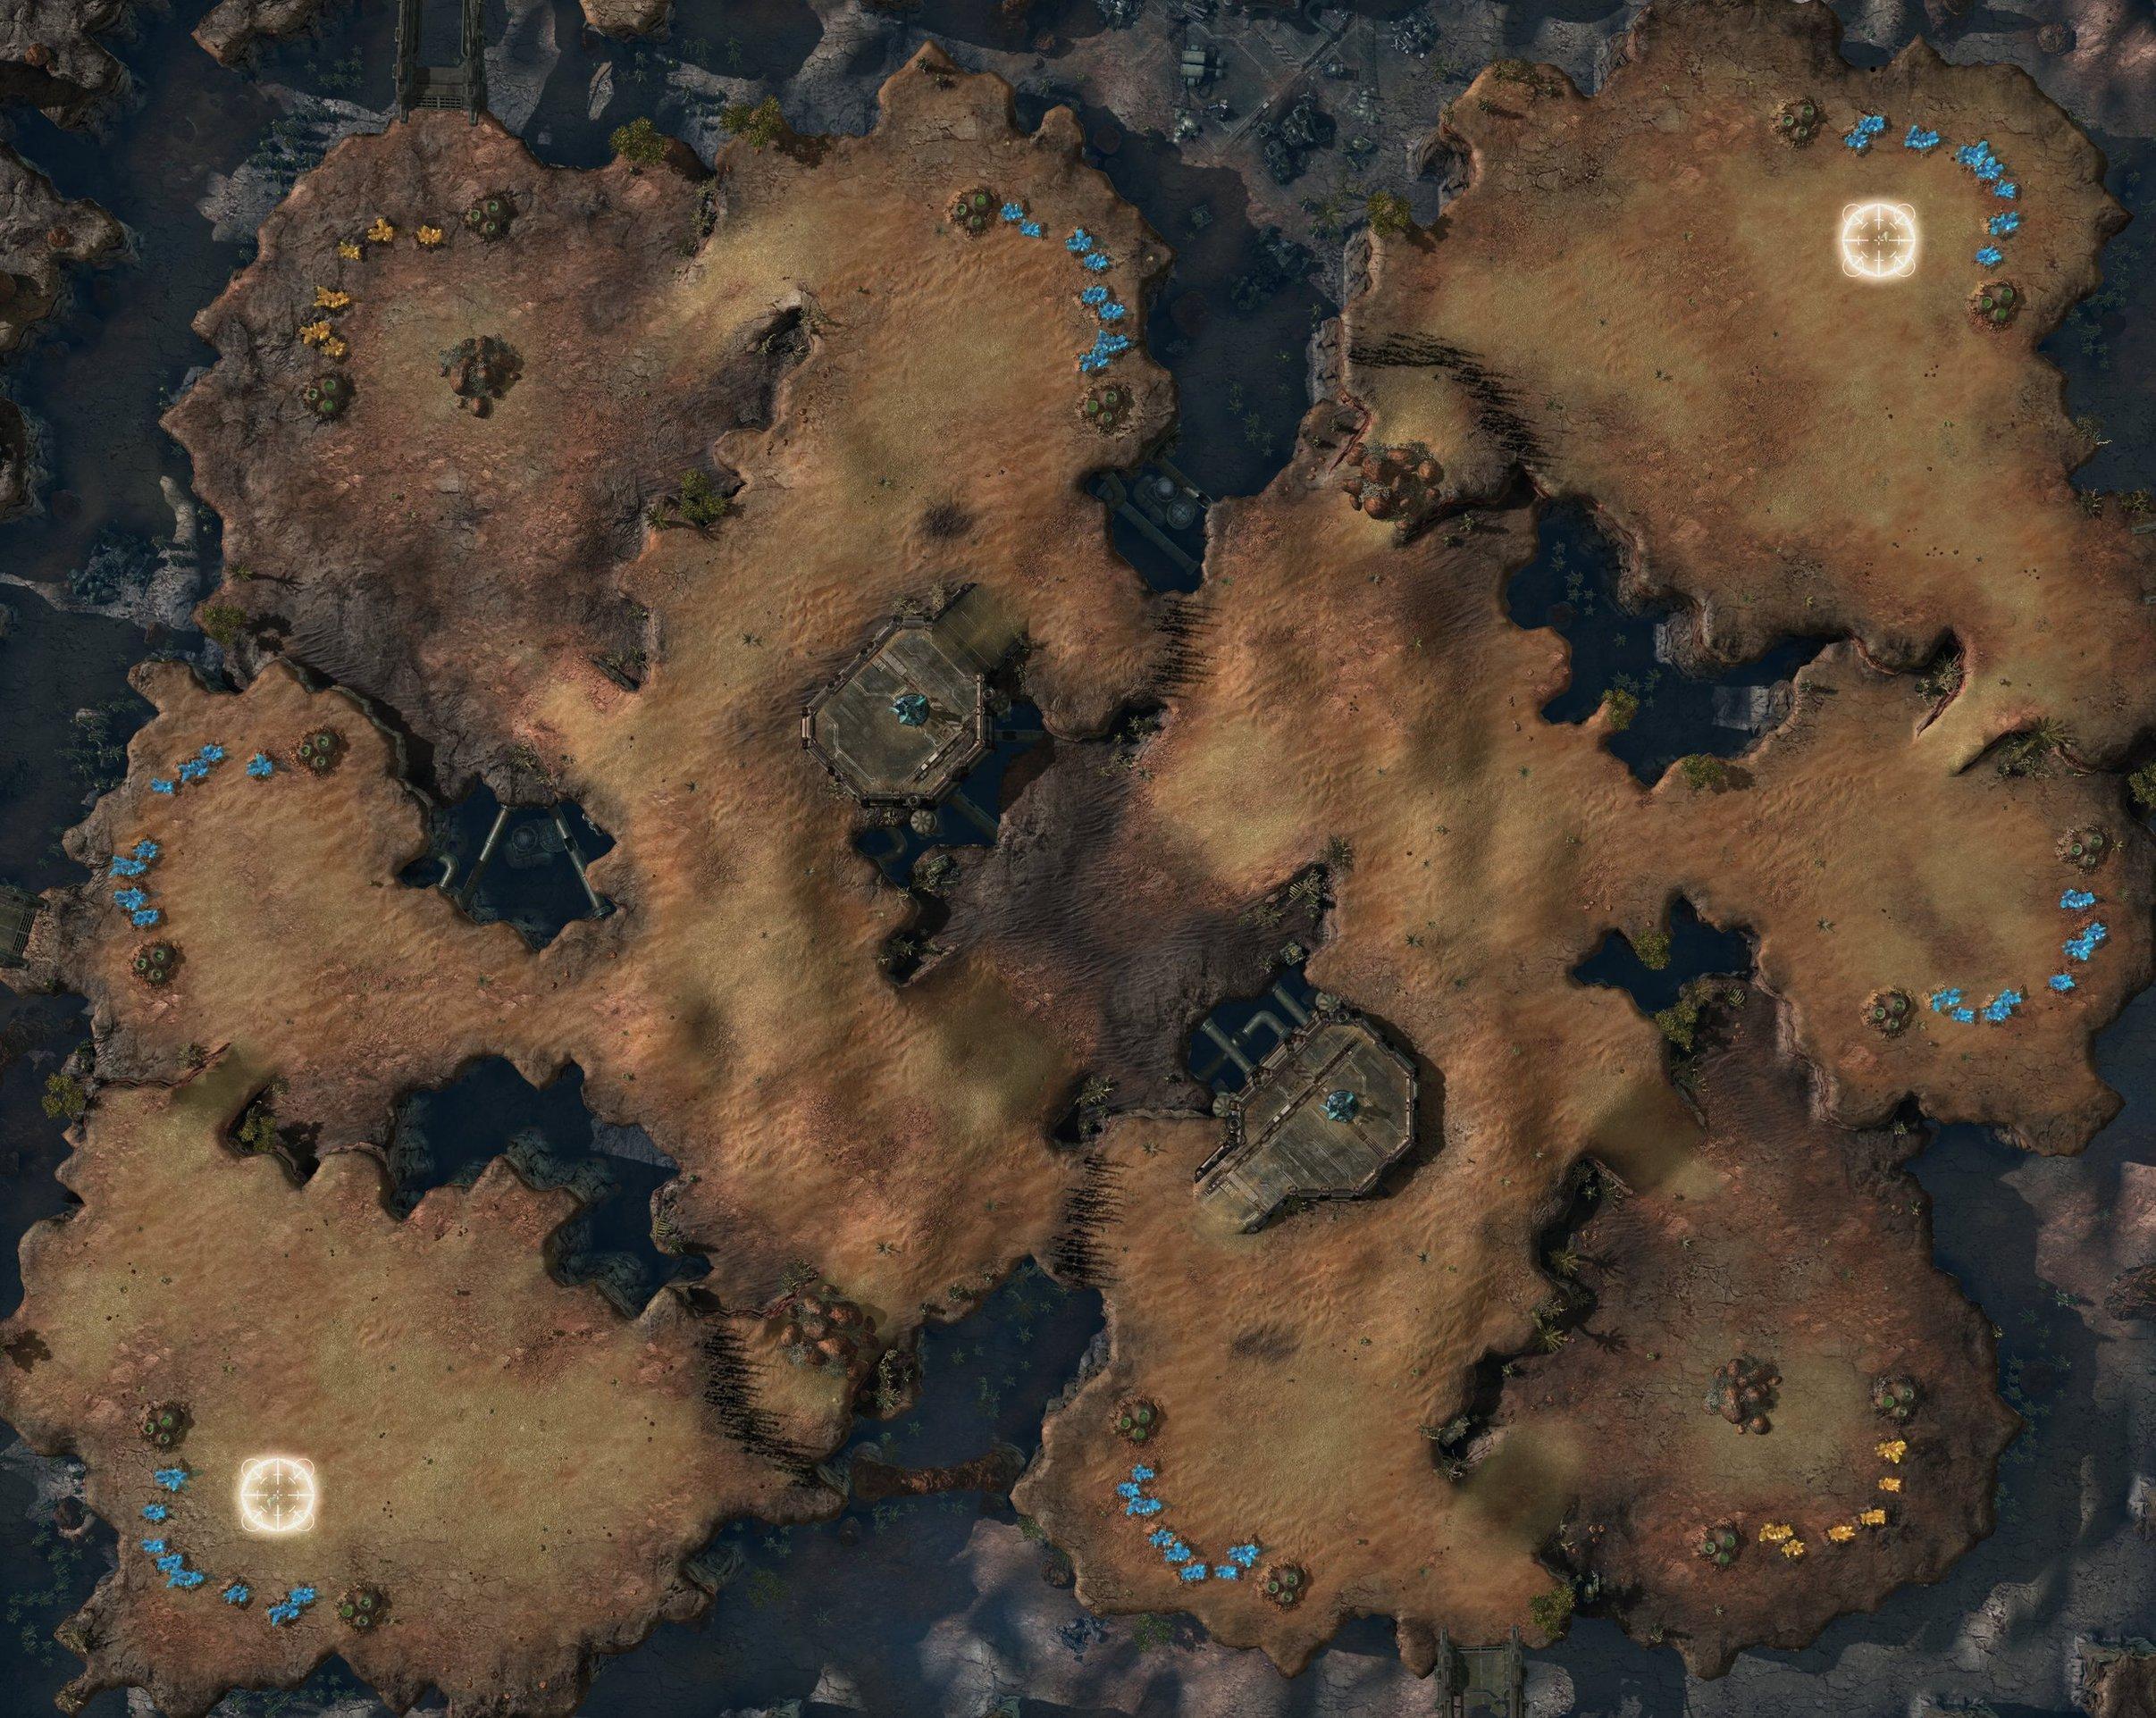 Starcraft 2 Maps Index of /bordel/Starcraft 2/Maps/1v1/ Starcraft 2 Maps